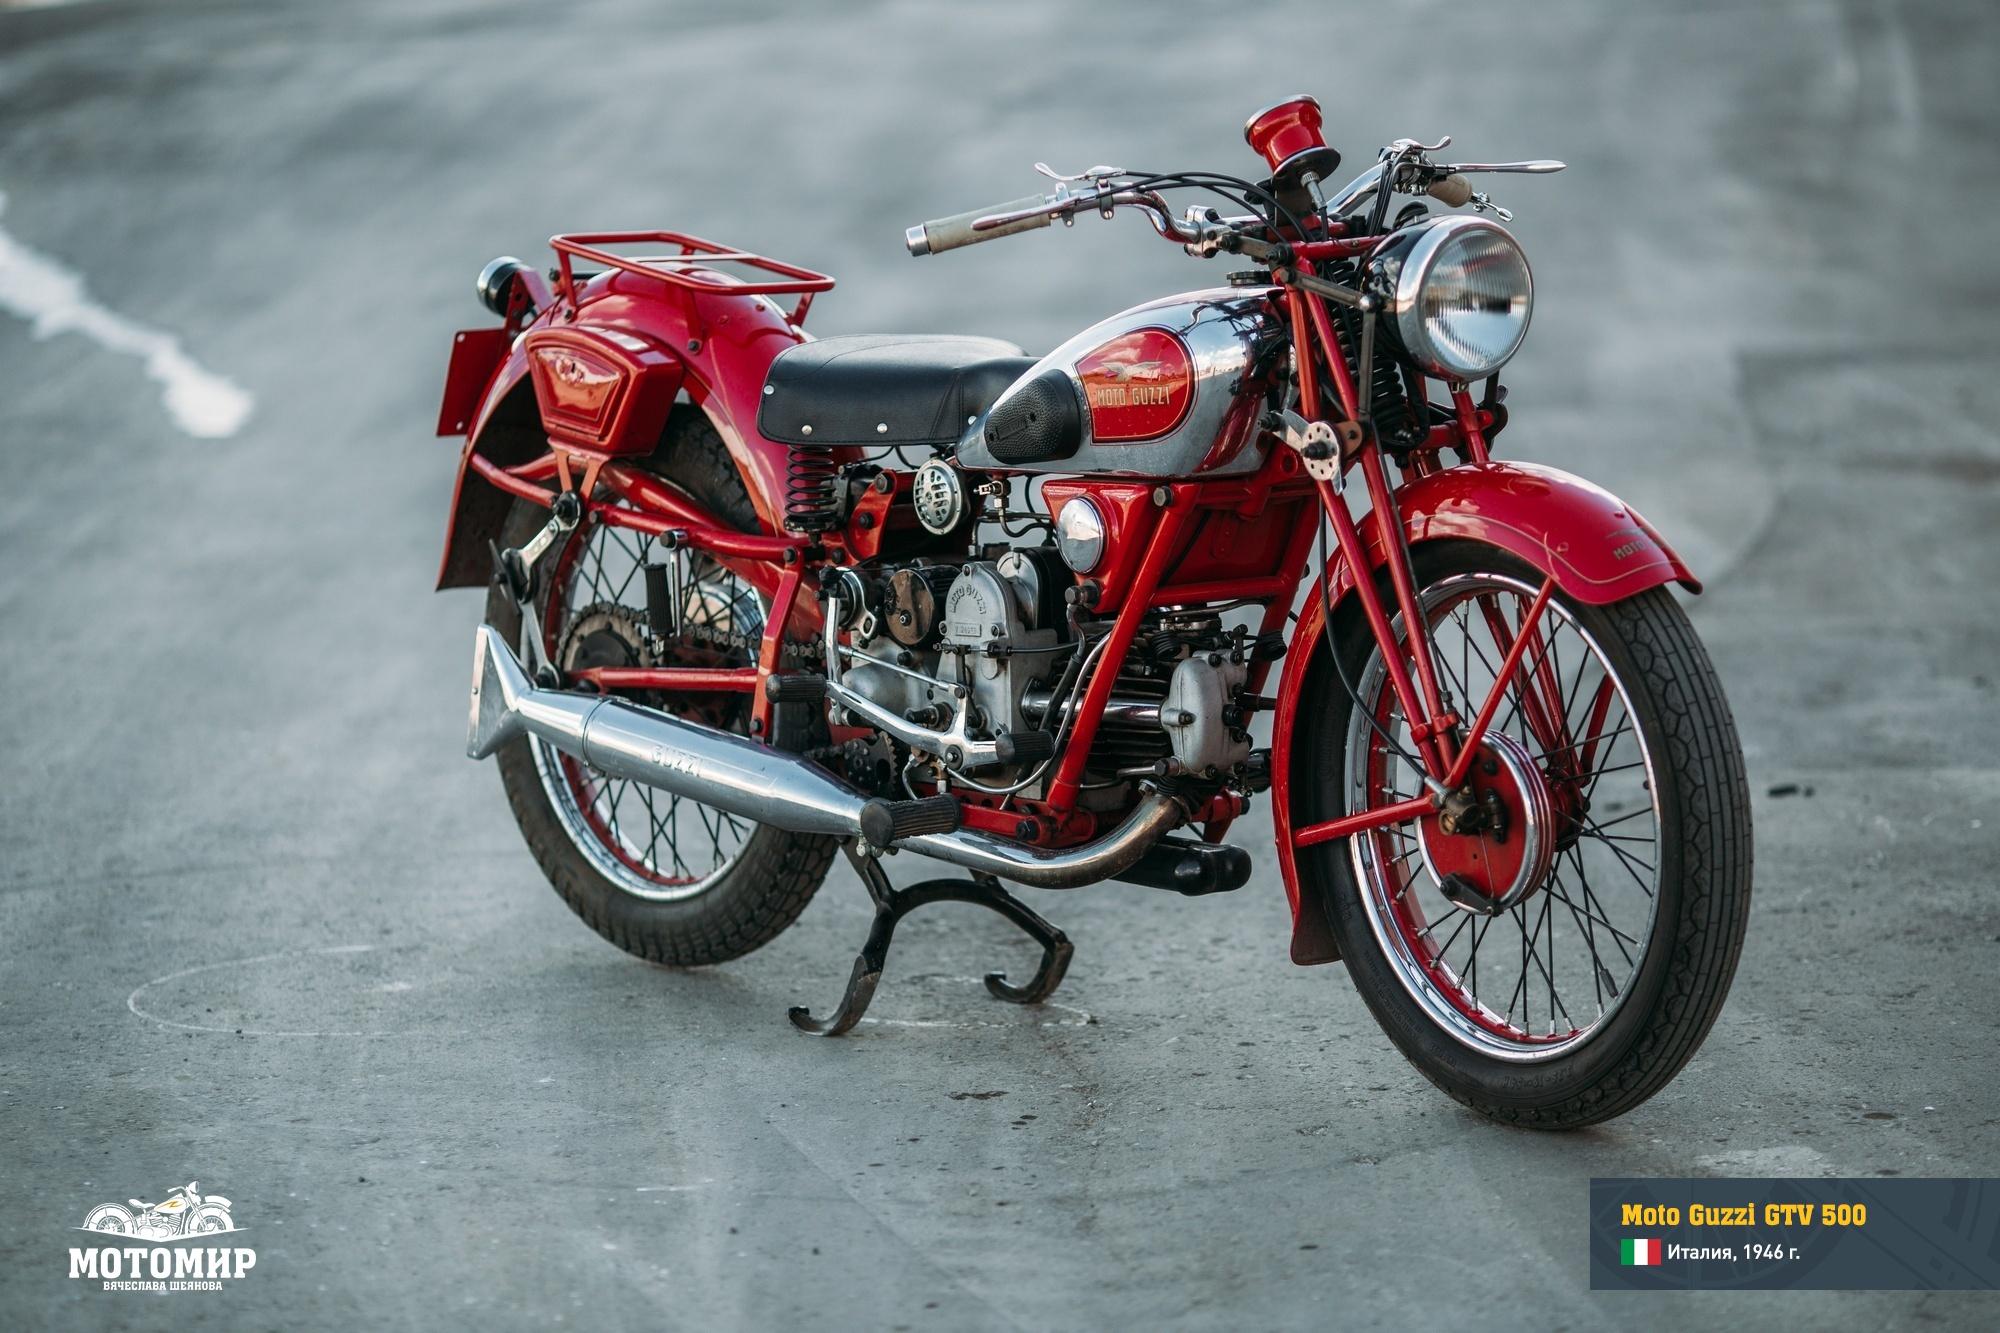 moto-guzzi-gtv-500-201509-web-08